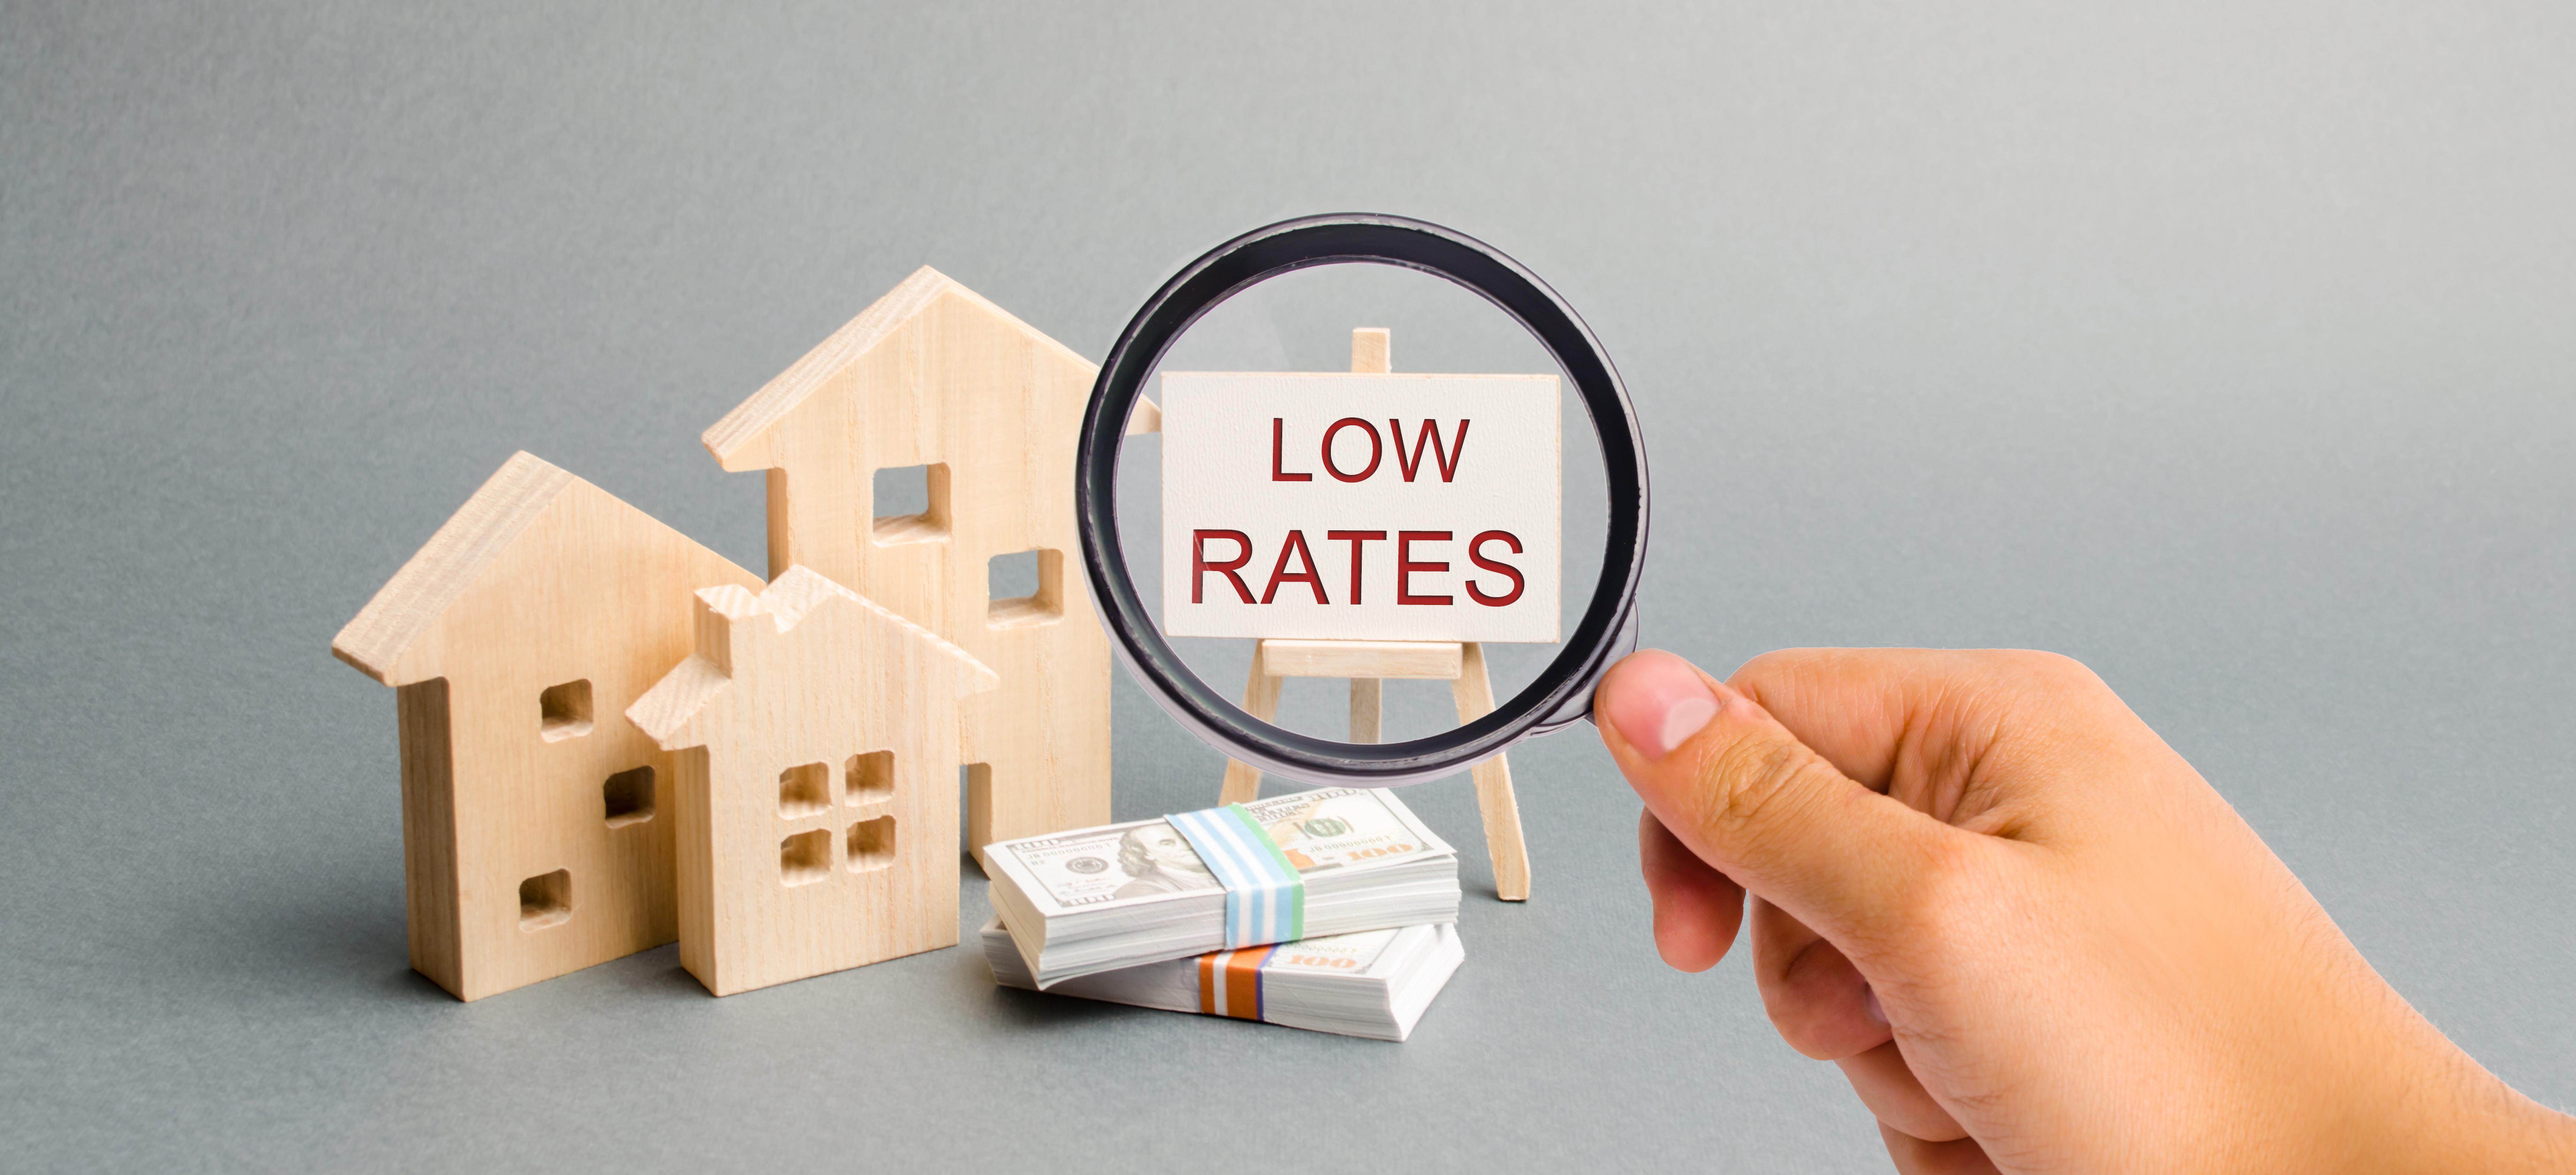 Lower interest rates of flexi loan